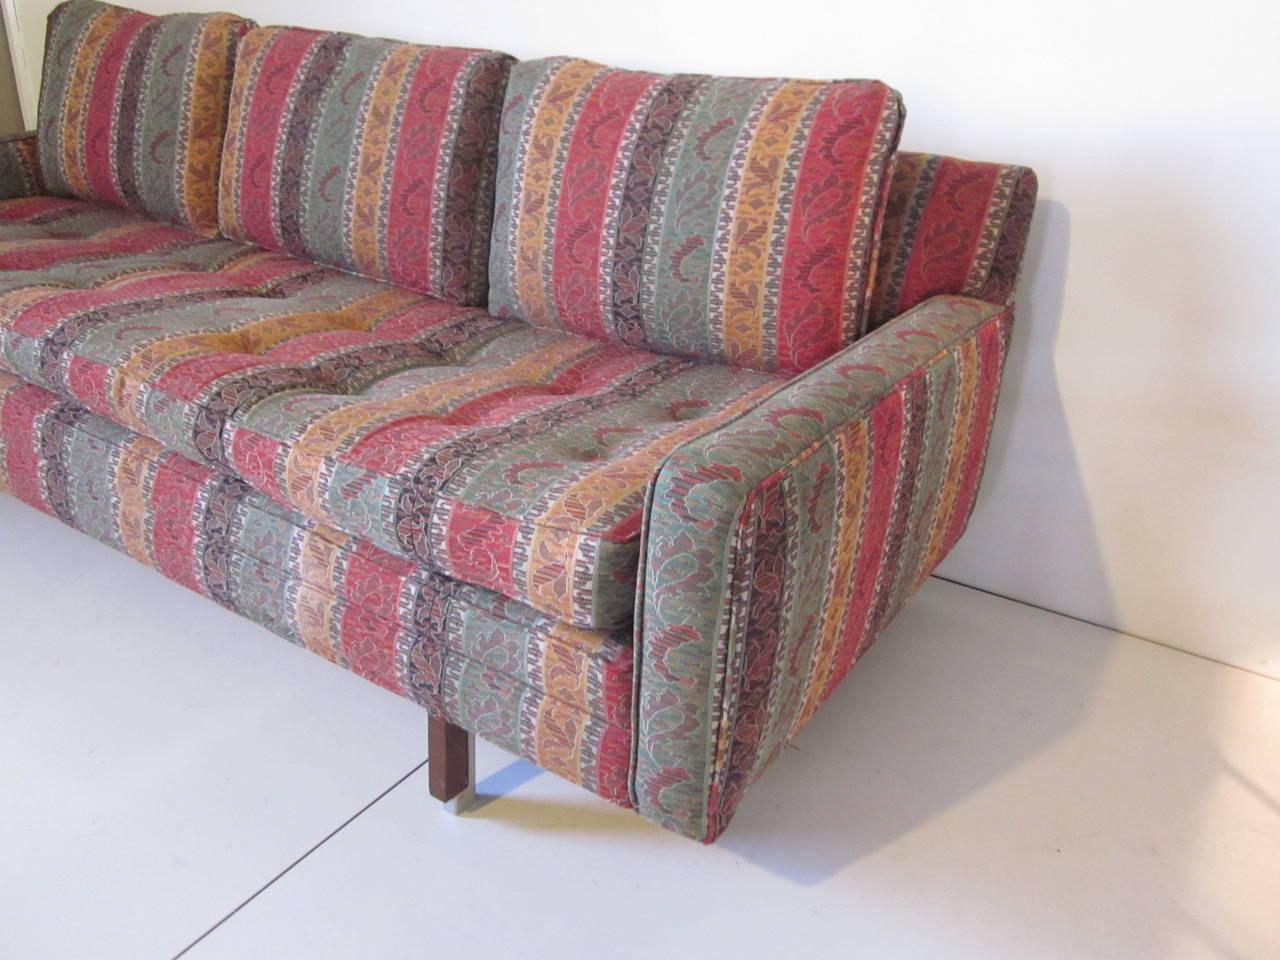 Brian Kane Sofa For Metropolitan At 1stdibs